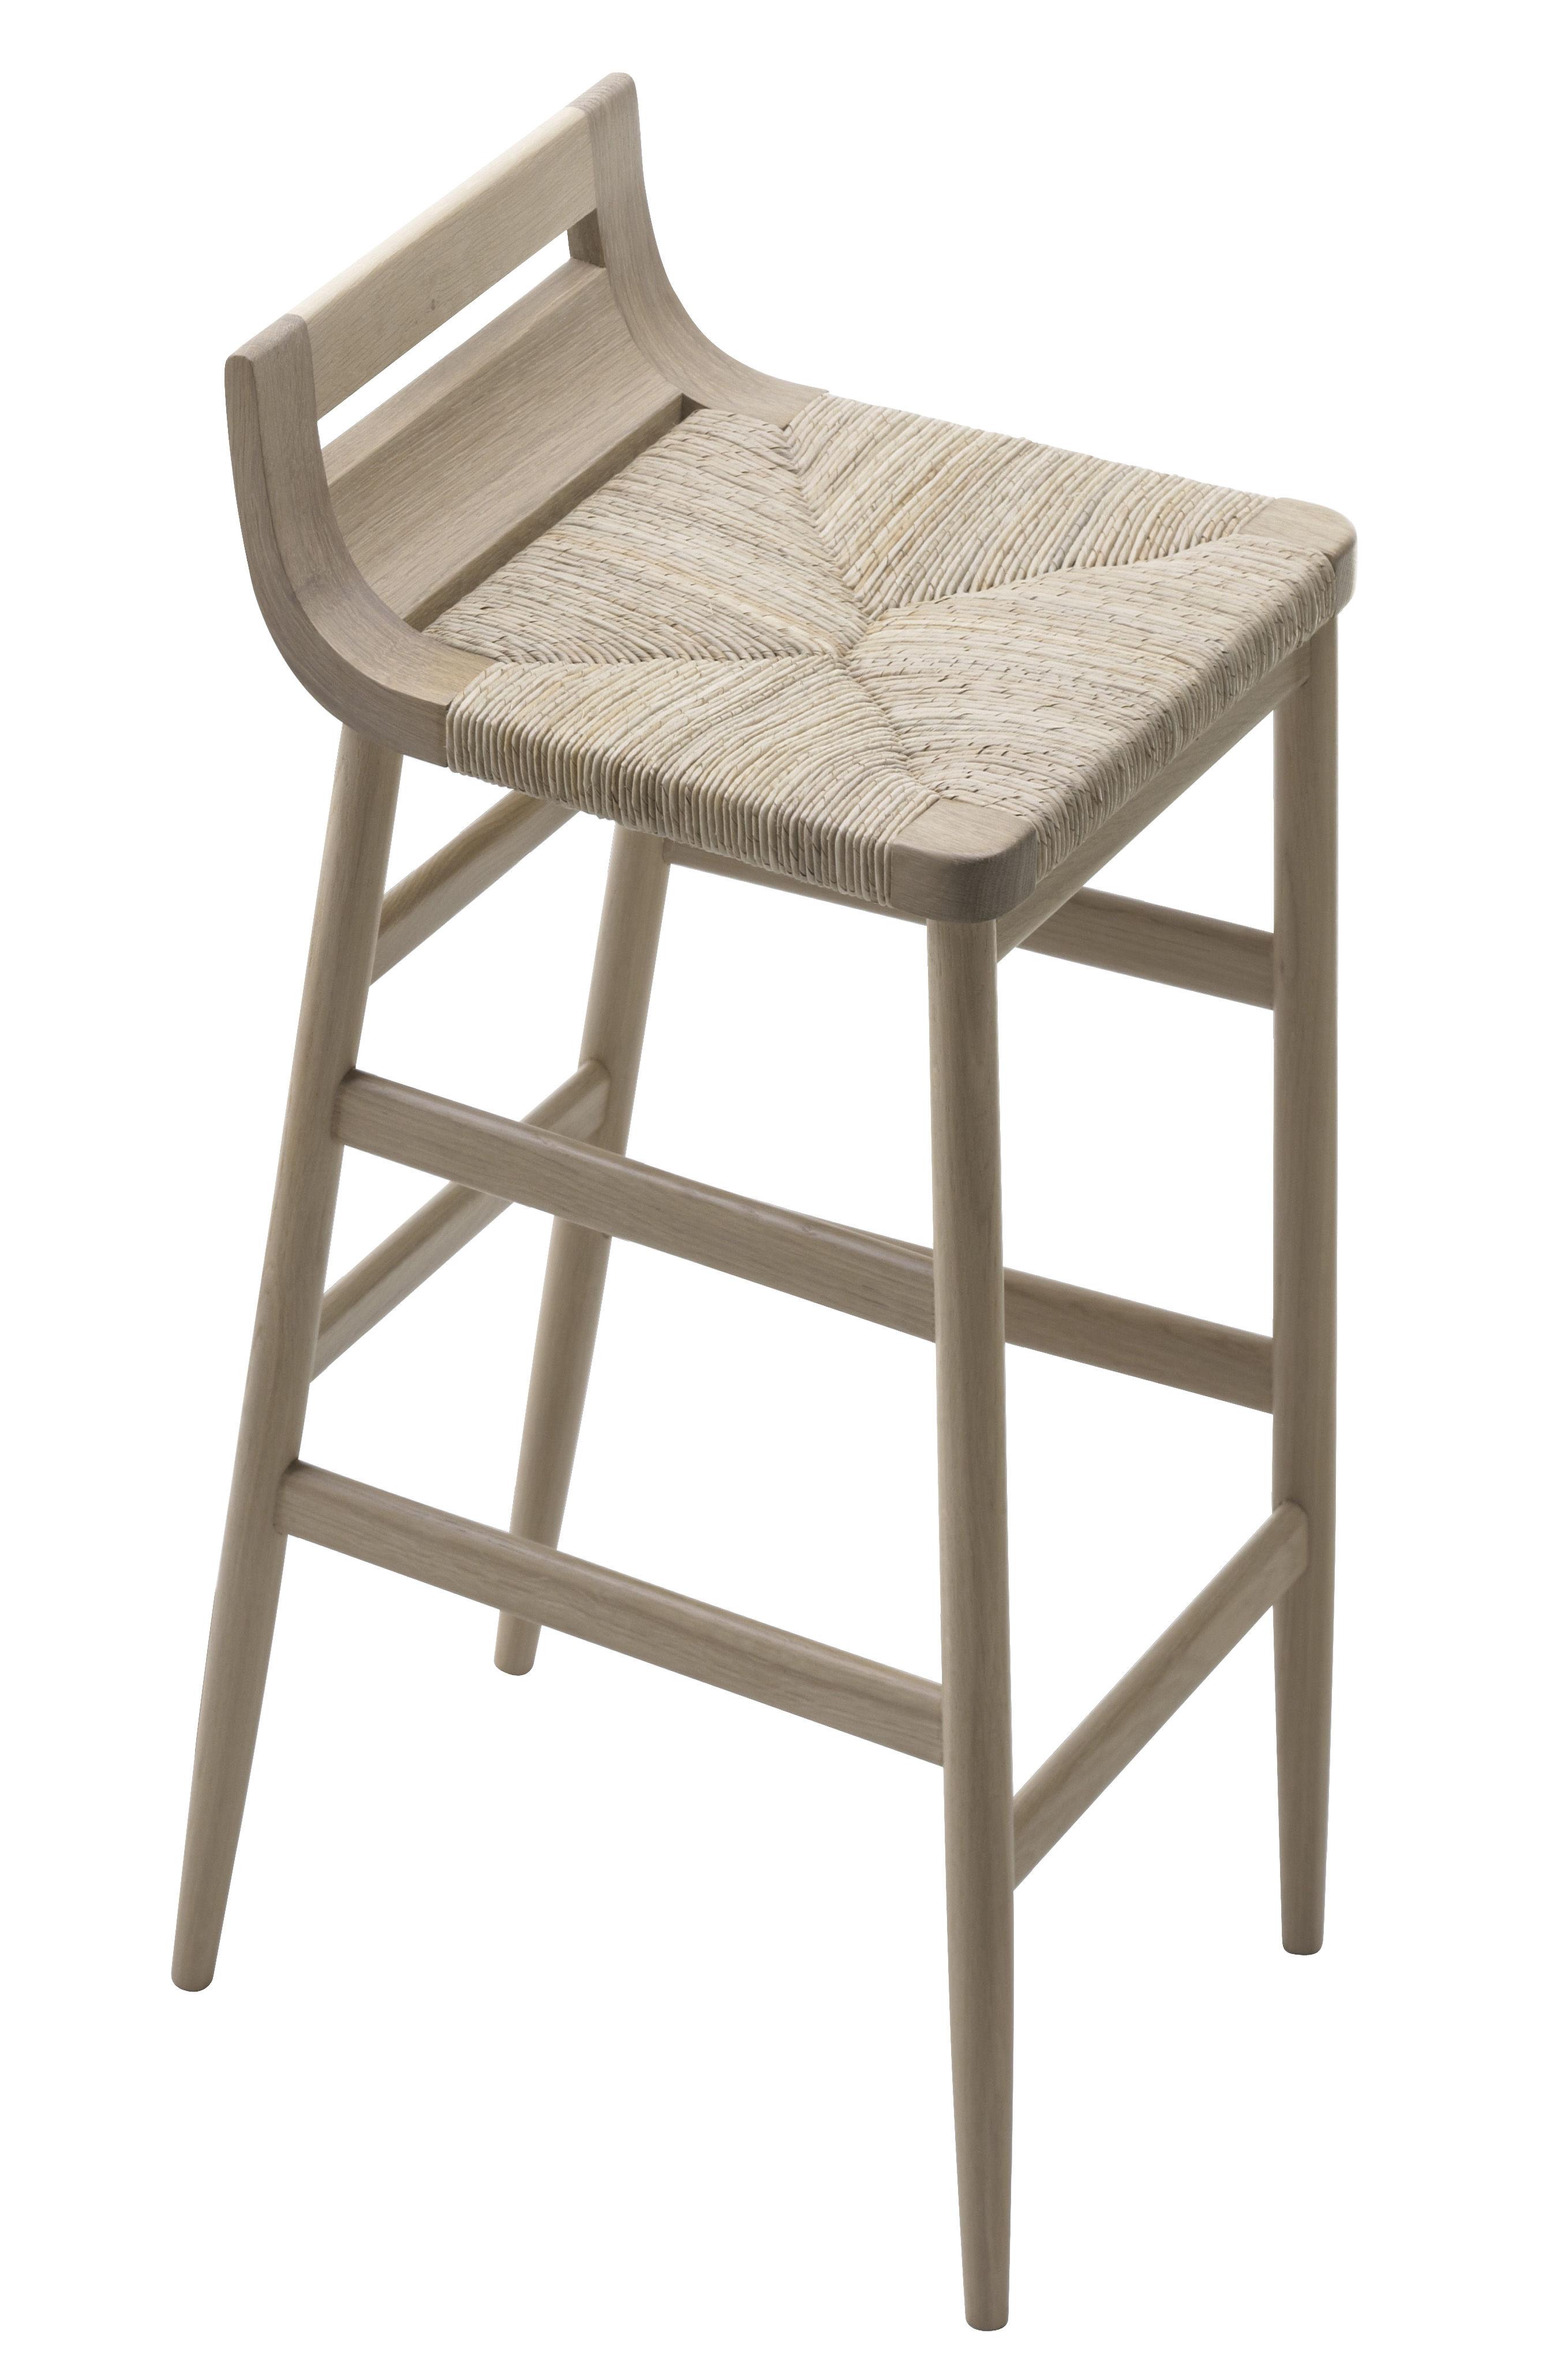 Furniture - Bar Stools - Kimua Bar stool - H 80 cm - Wood & straw by Alki - Natural oak - Solid oak